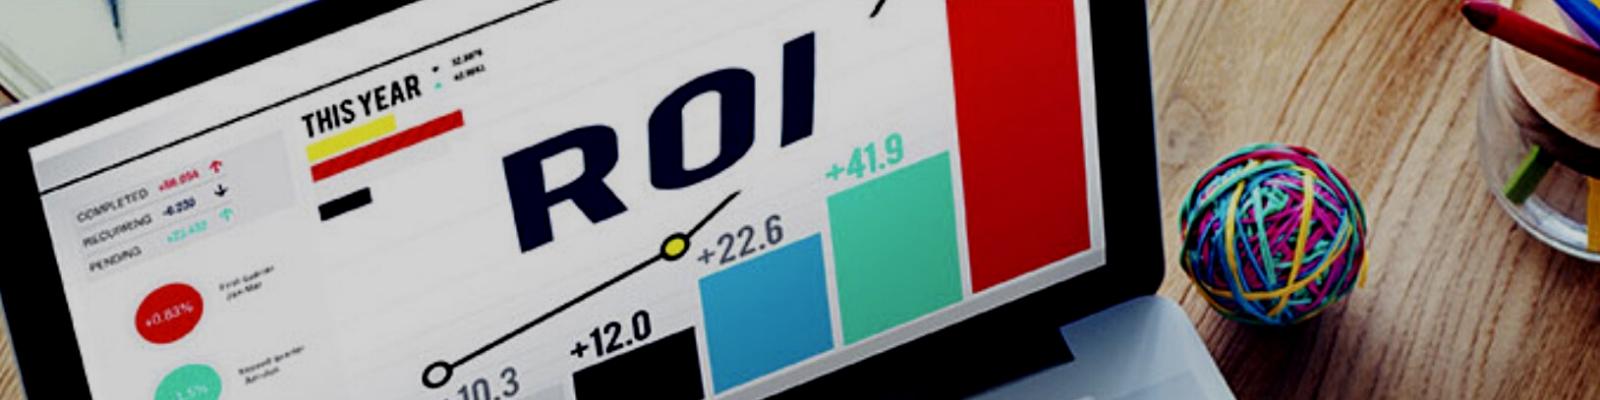 pillar-definitive-guide-measuring-tracking-sales-training-roi-hero